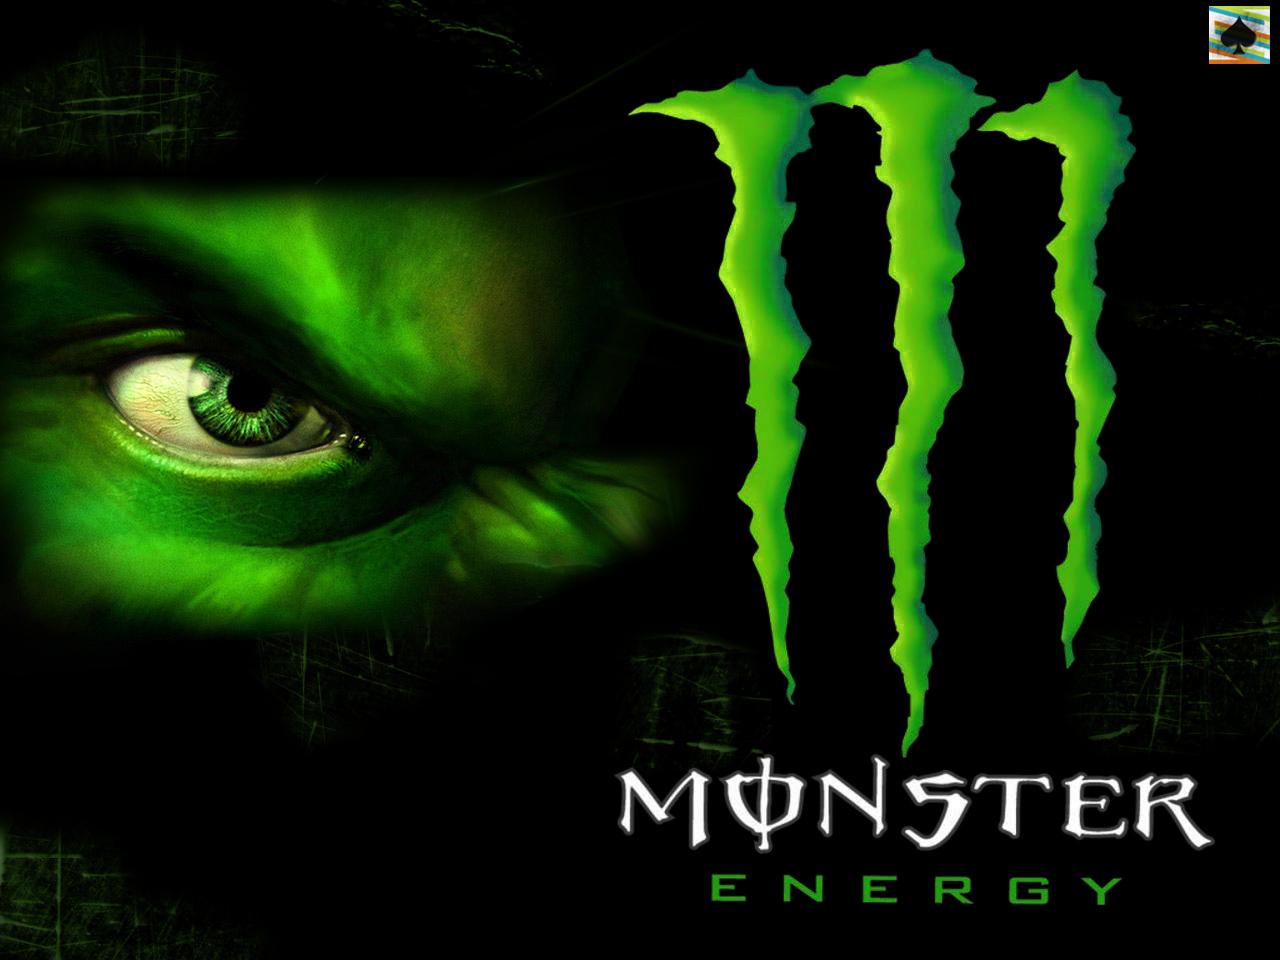 etiquetas ambiente de trabalho desktop monster energy sport wallpapers 1280x960